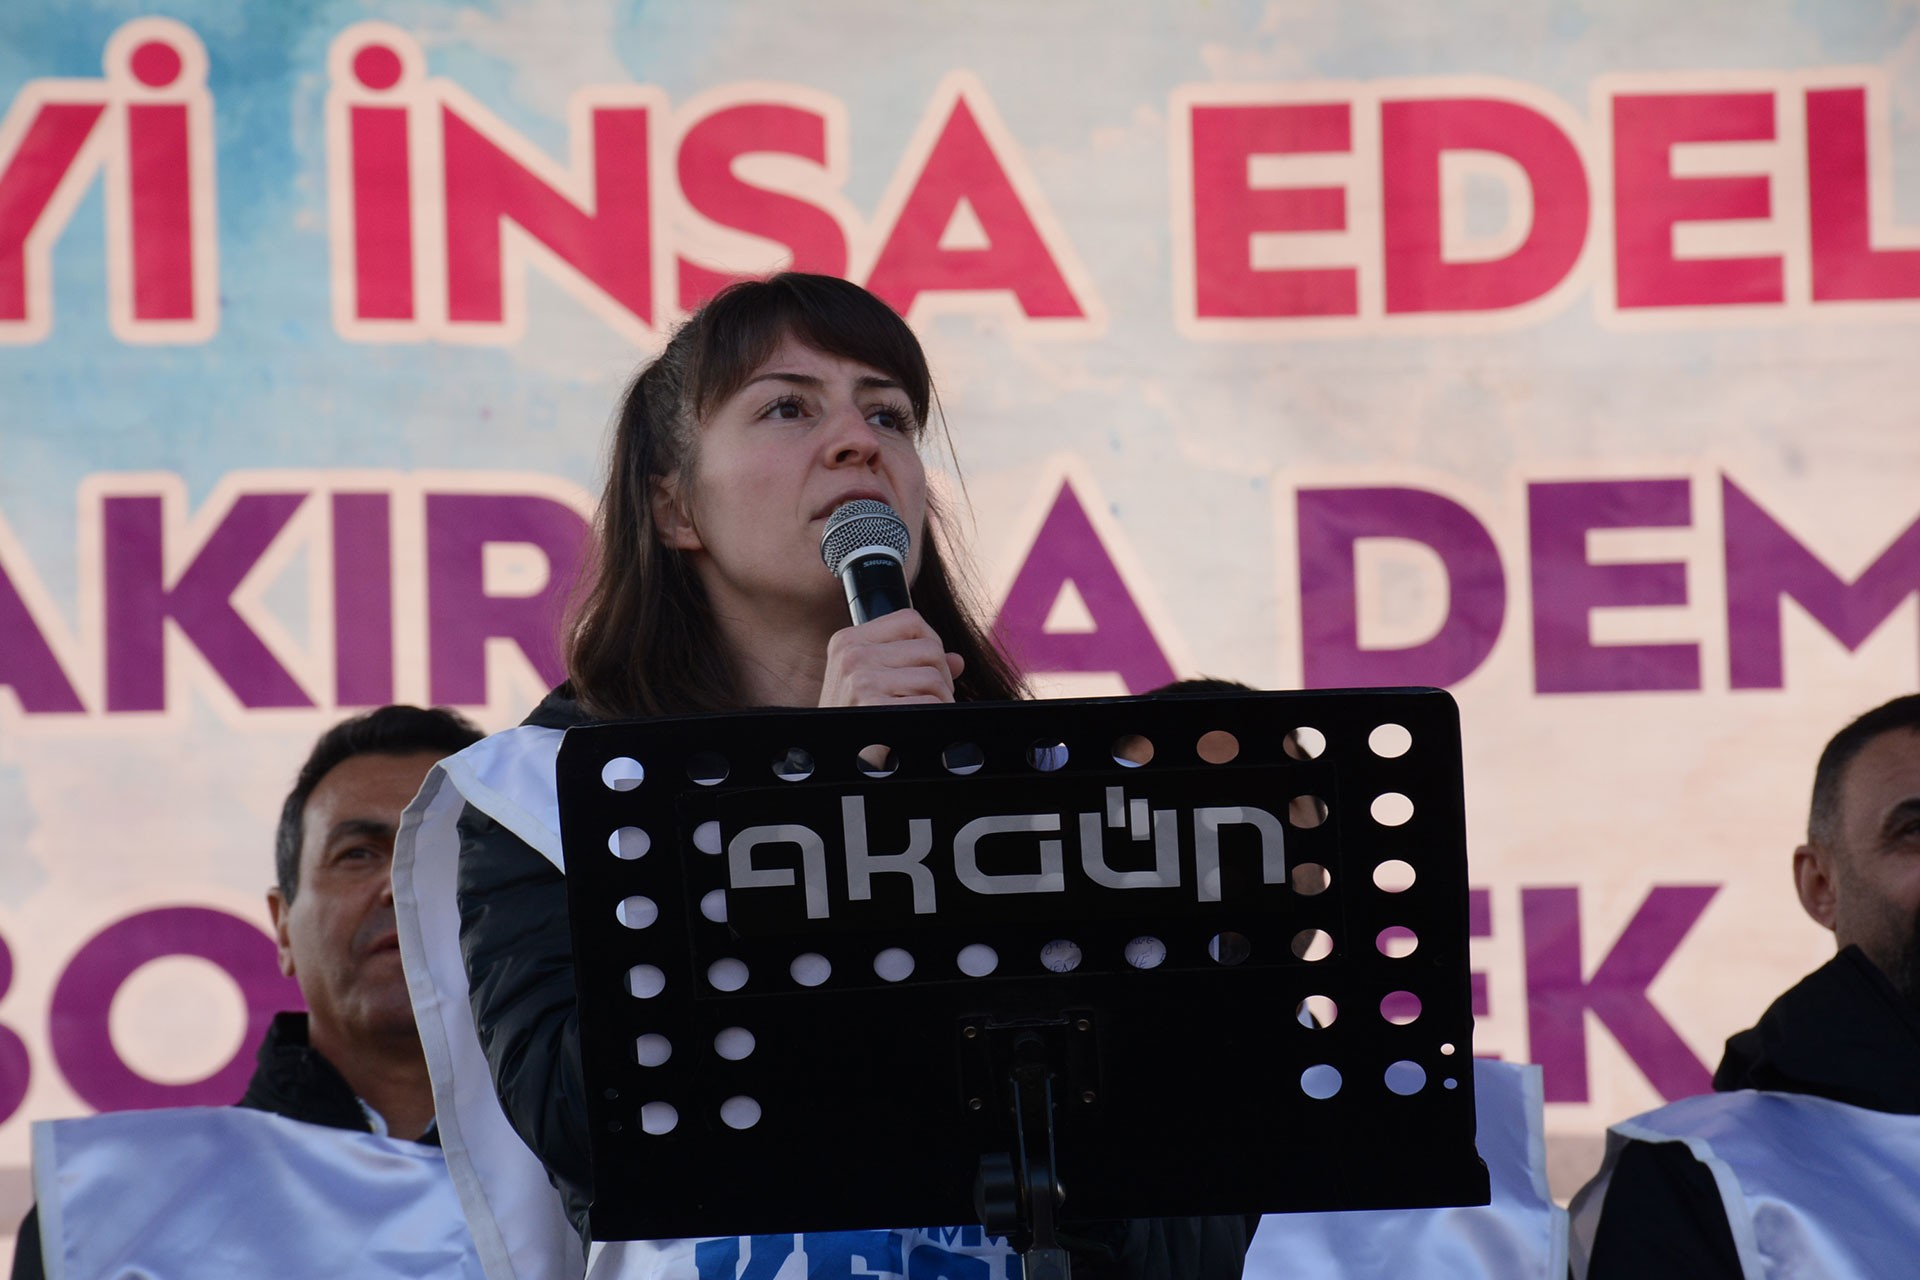 Diyarbakır'da toplumsal barış ve insanca yaşam mitingi.